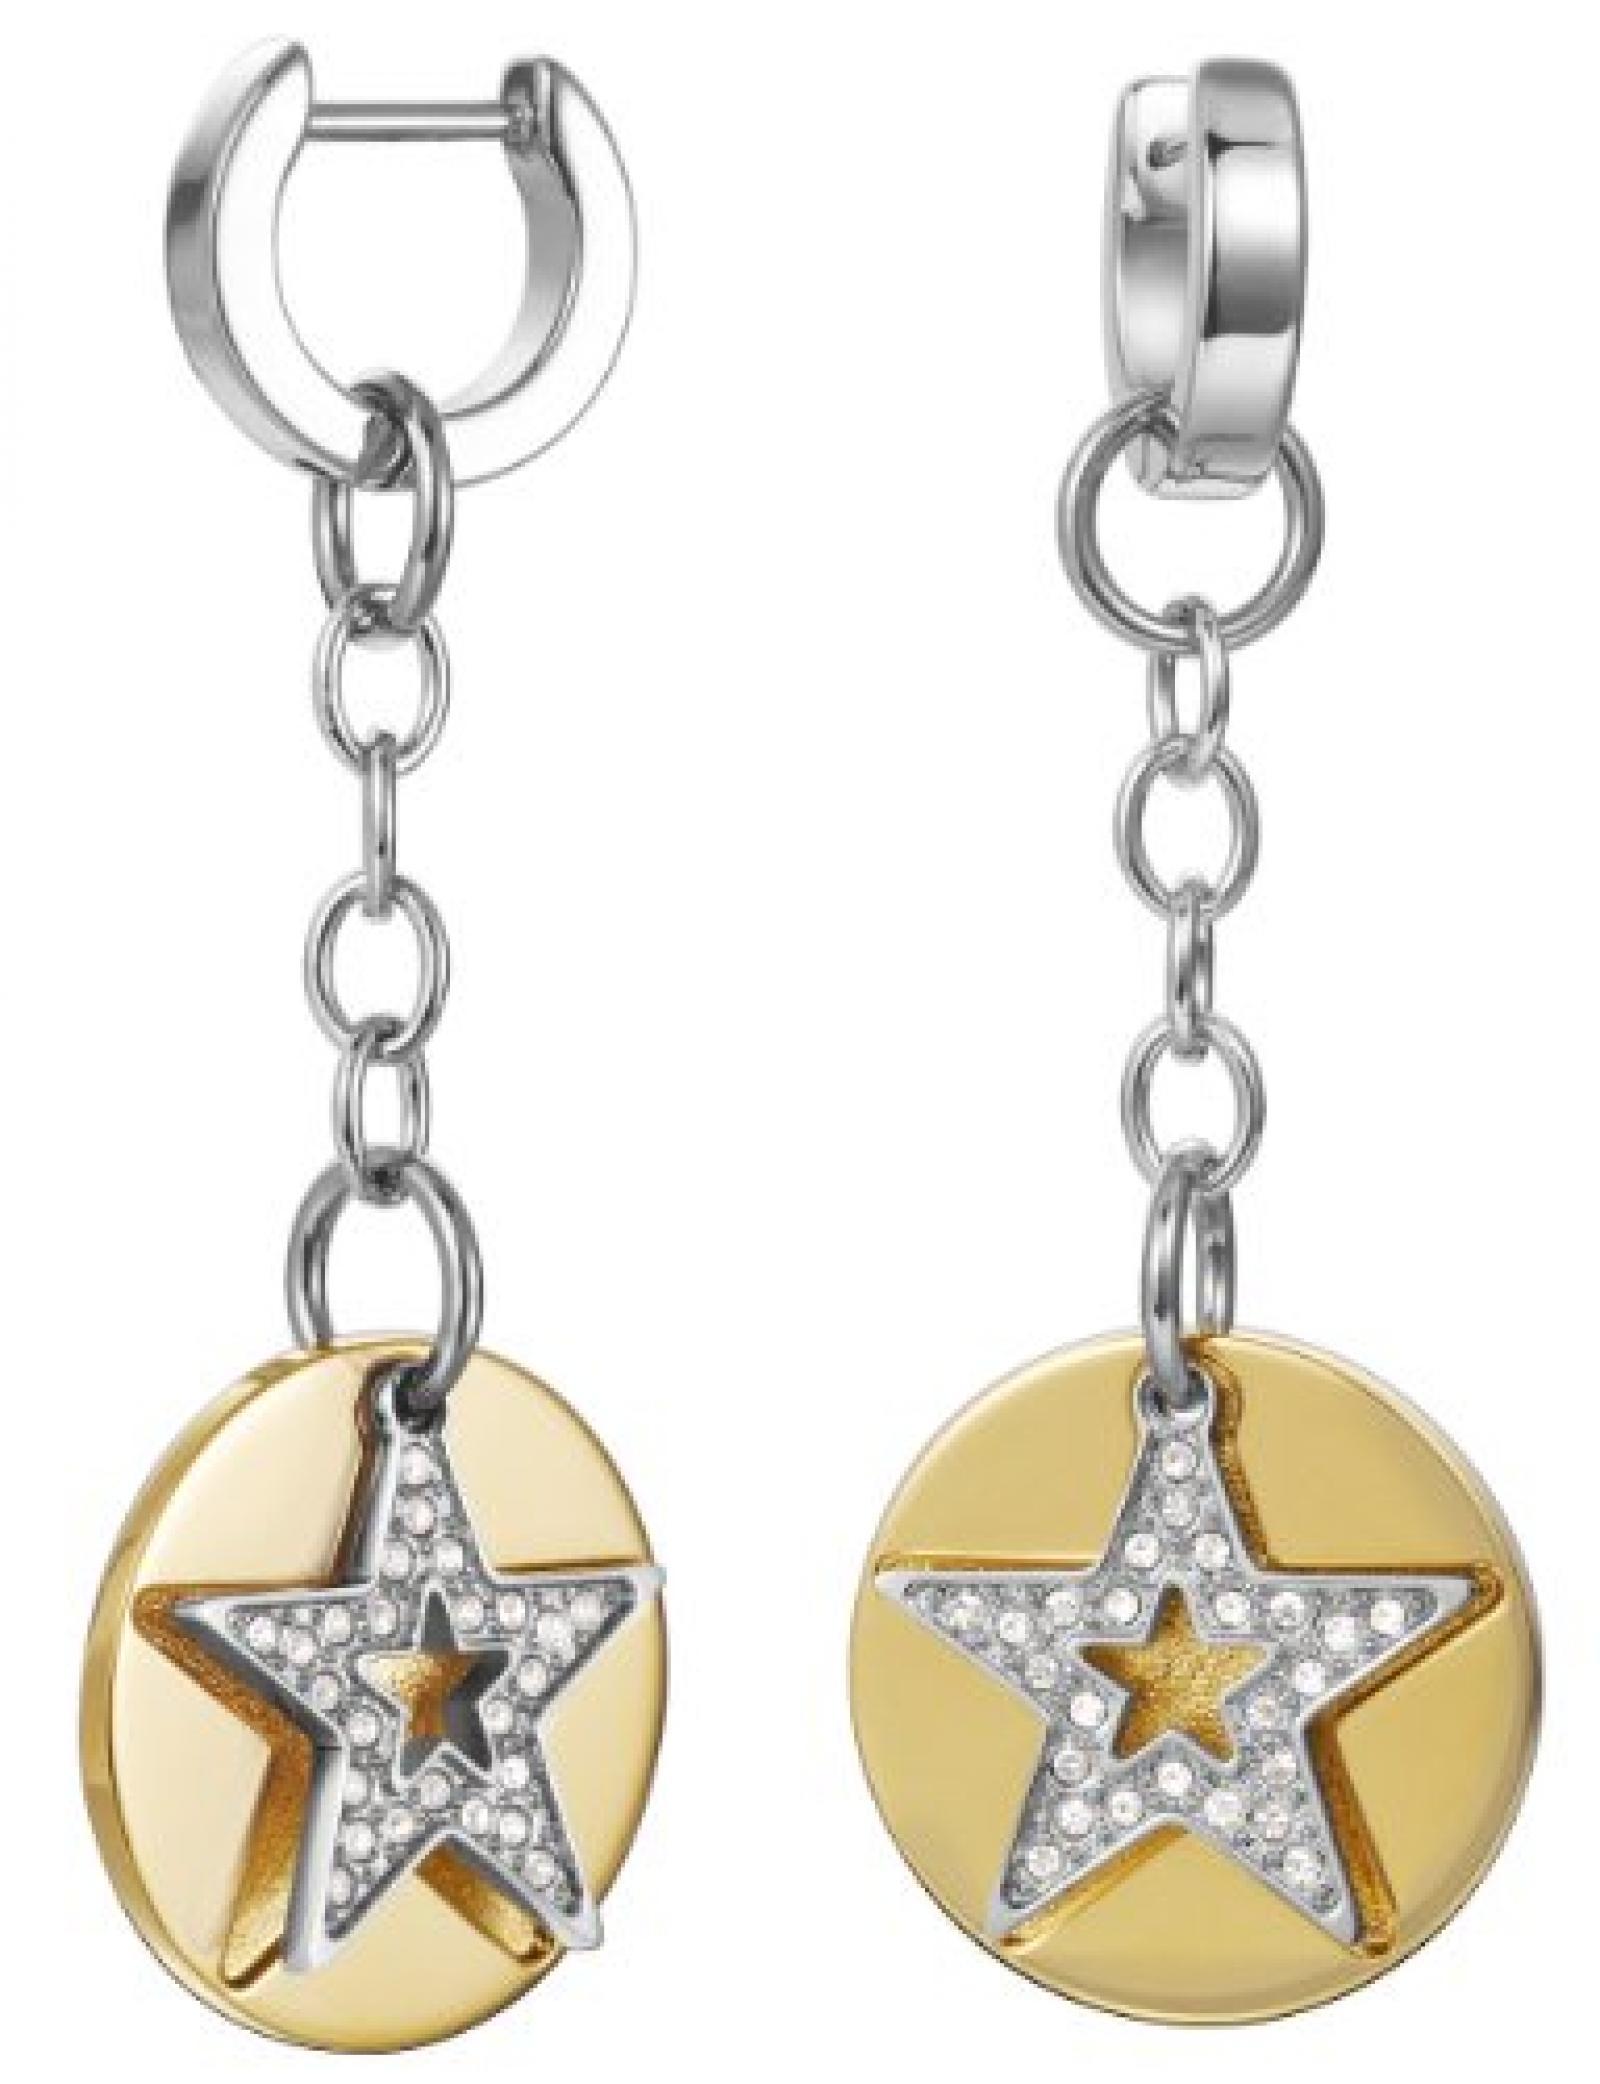 Esprit Damen-Creolen Edelstahl rhodiniert Kristall Zirkonia Great Star Gold weiß ESCO11494B000